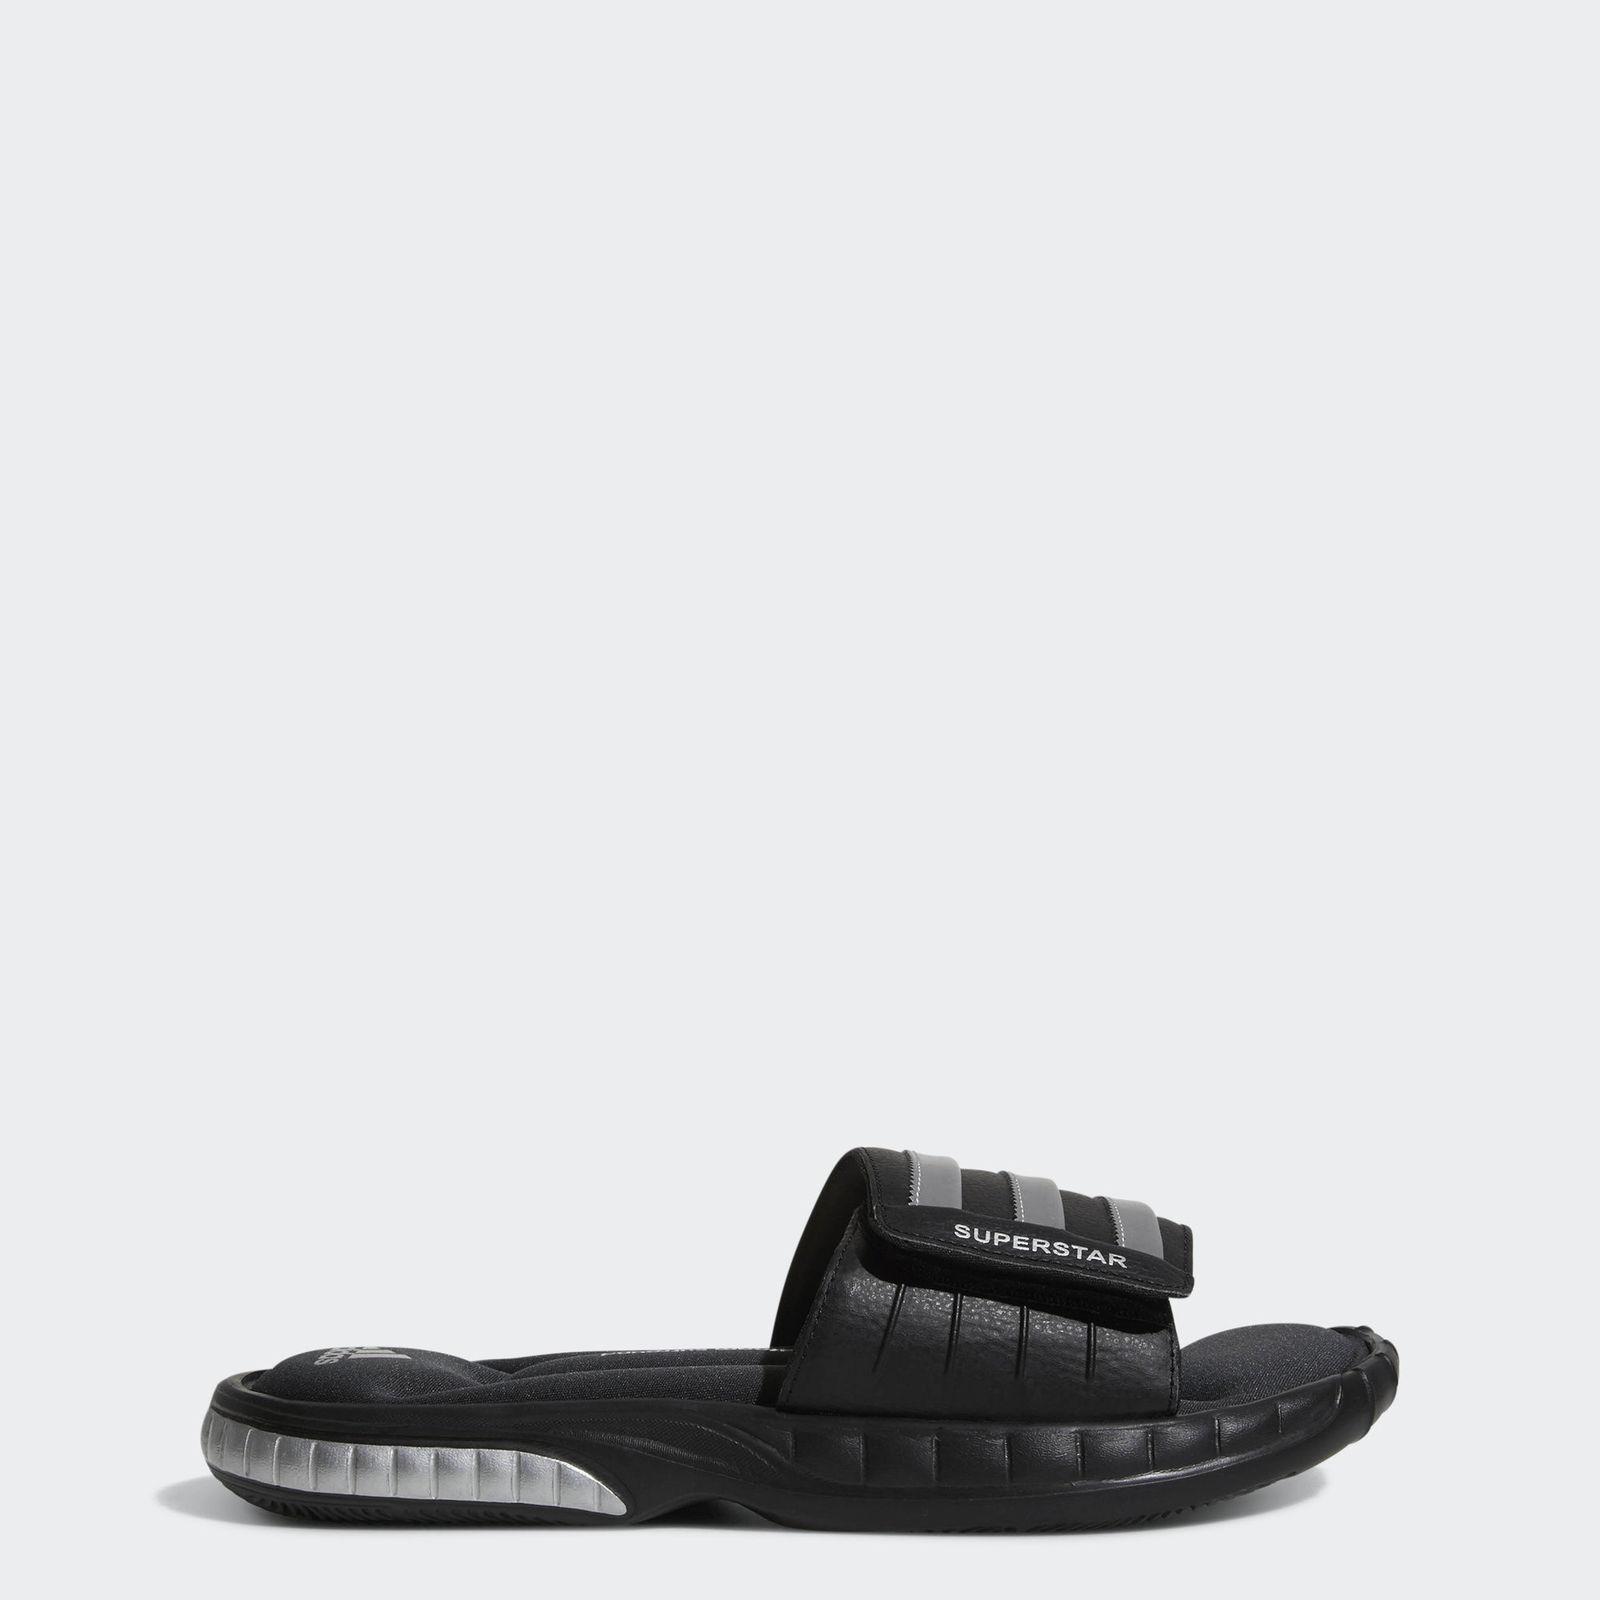 adidas Superstar 3G Slides Men's $16.99